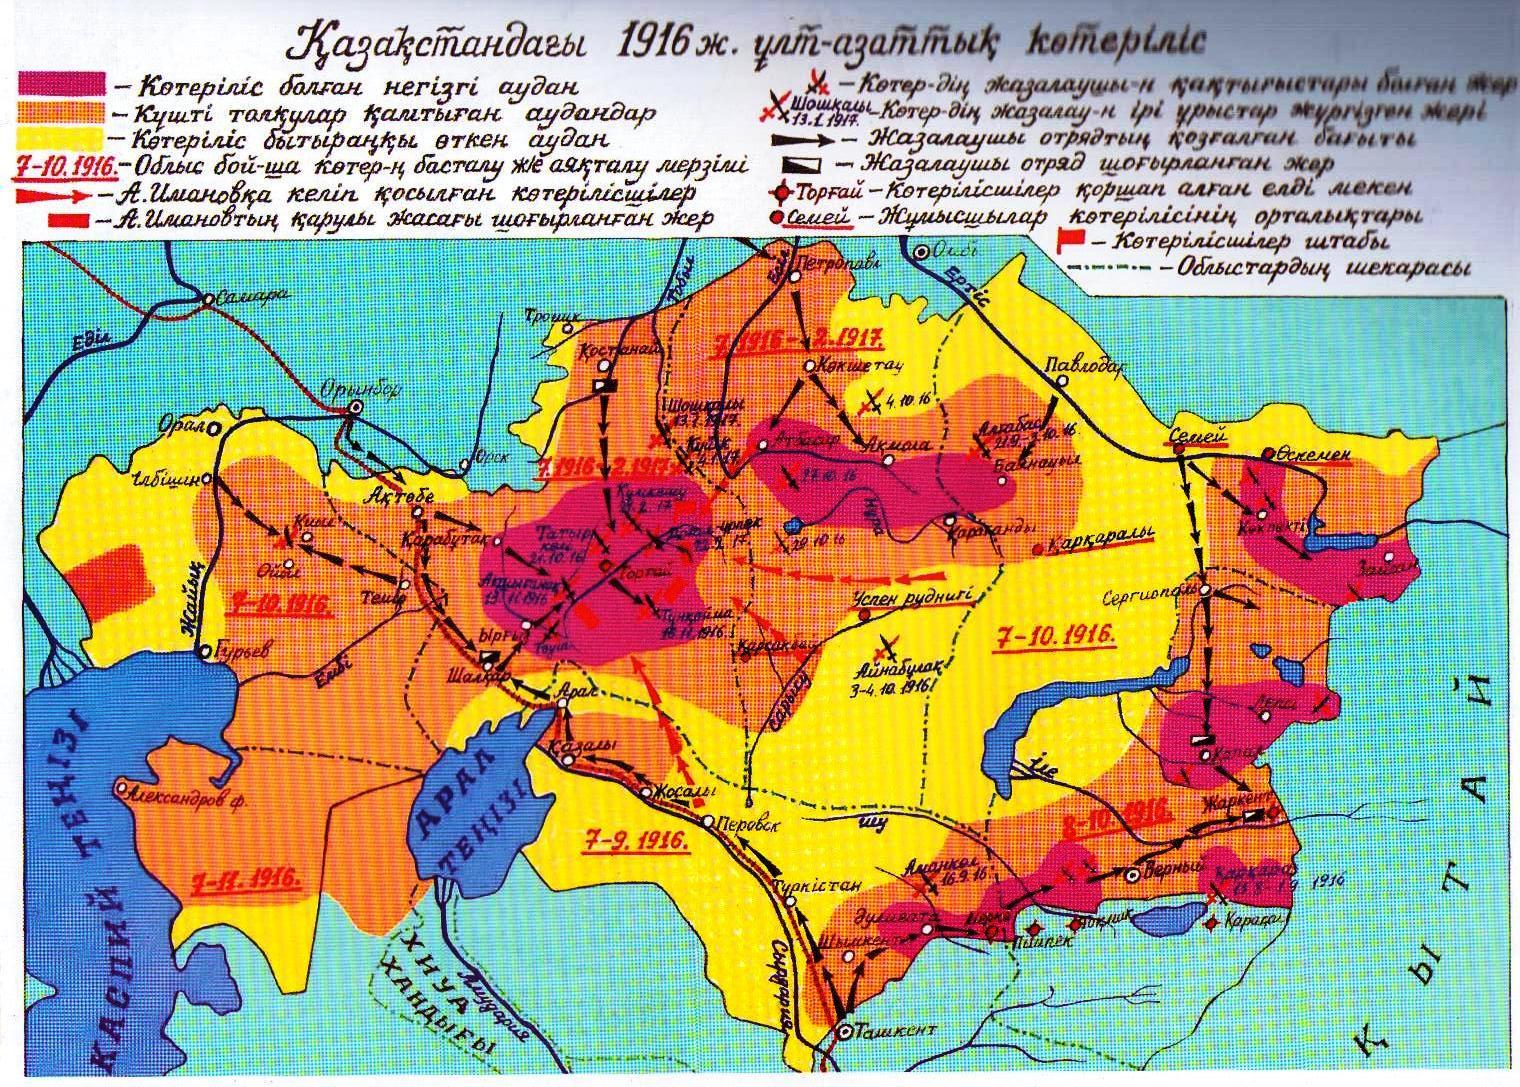 http://ansya.ru/health/azastan-tarihi-jne-oamdi-pnder-kafedrasi-v5/10.jpg